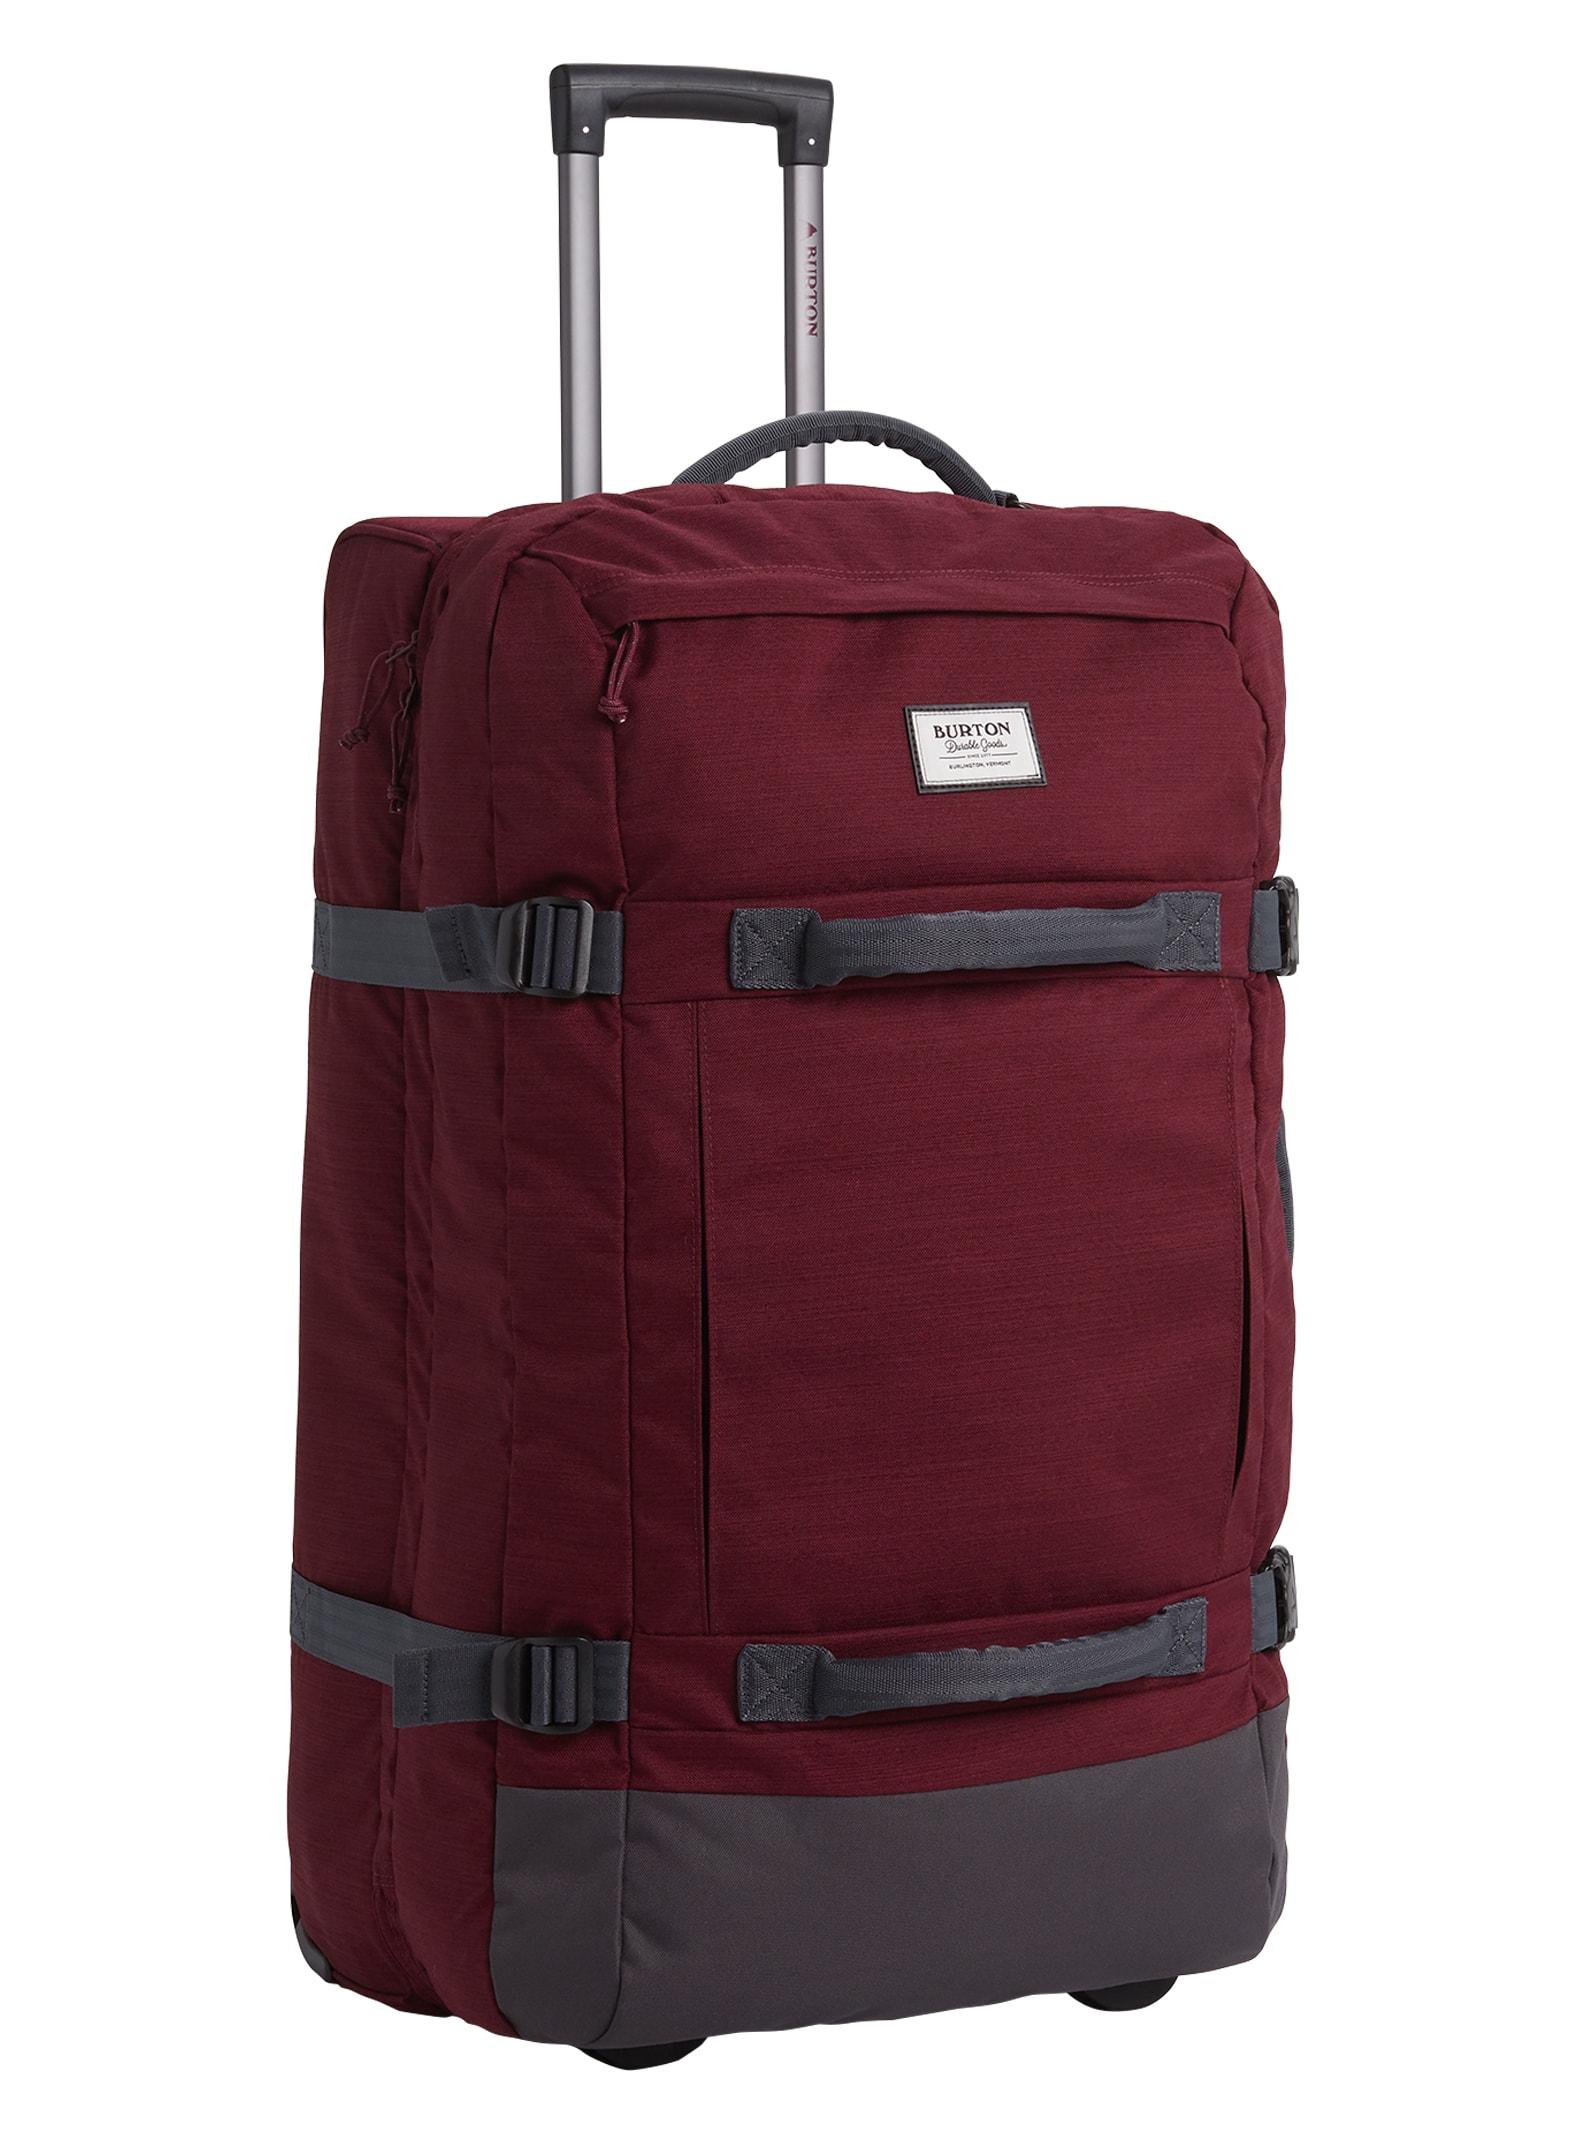 Burton Exodus Roller 120L Travel Bag